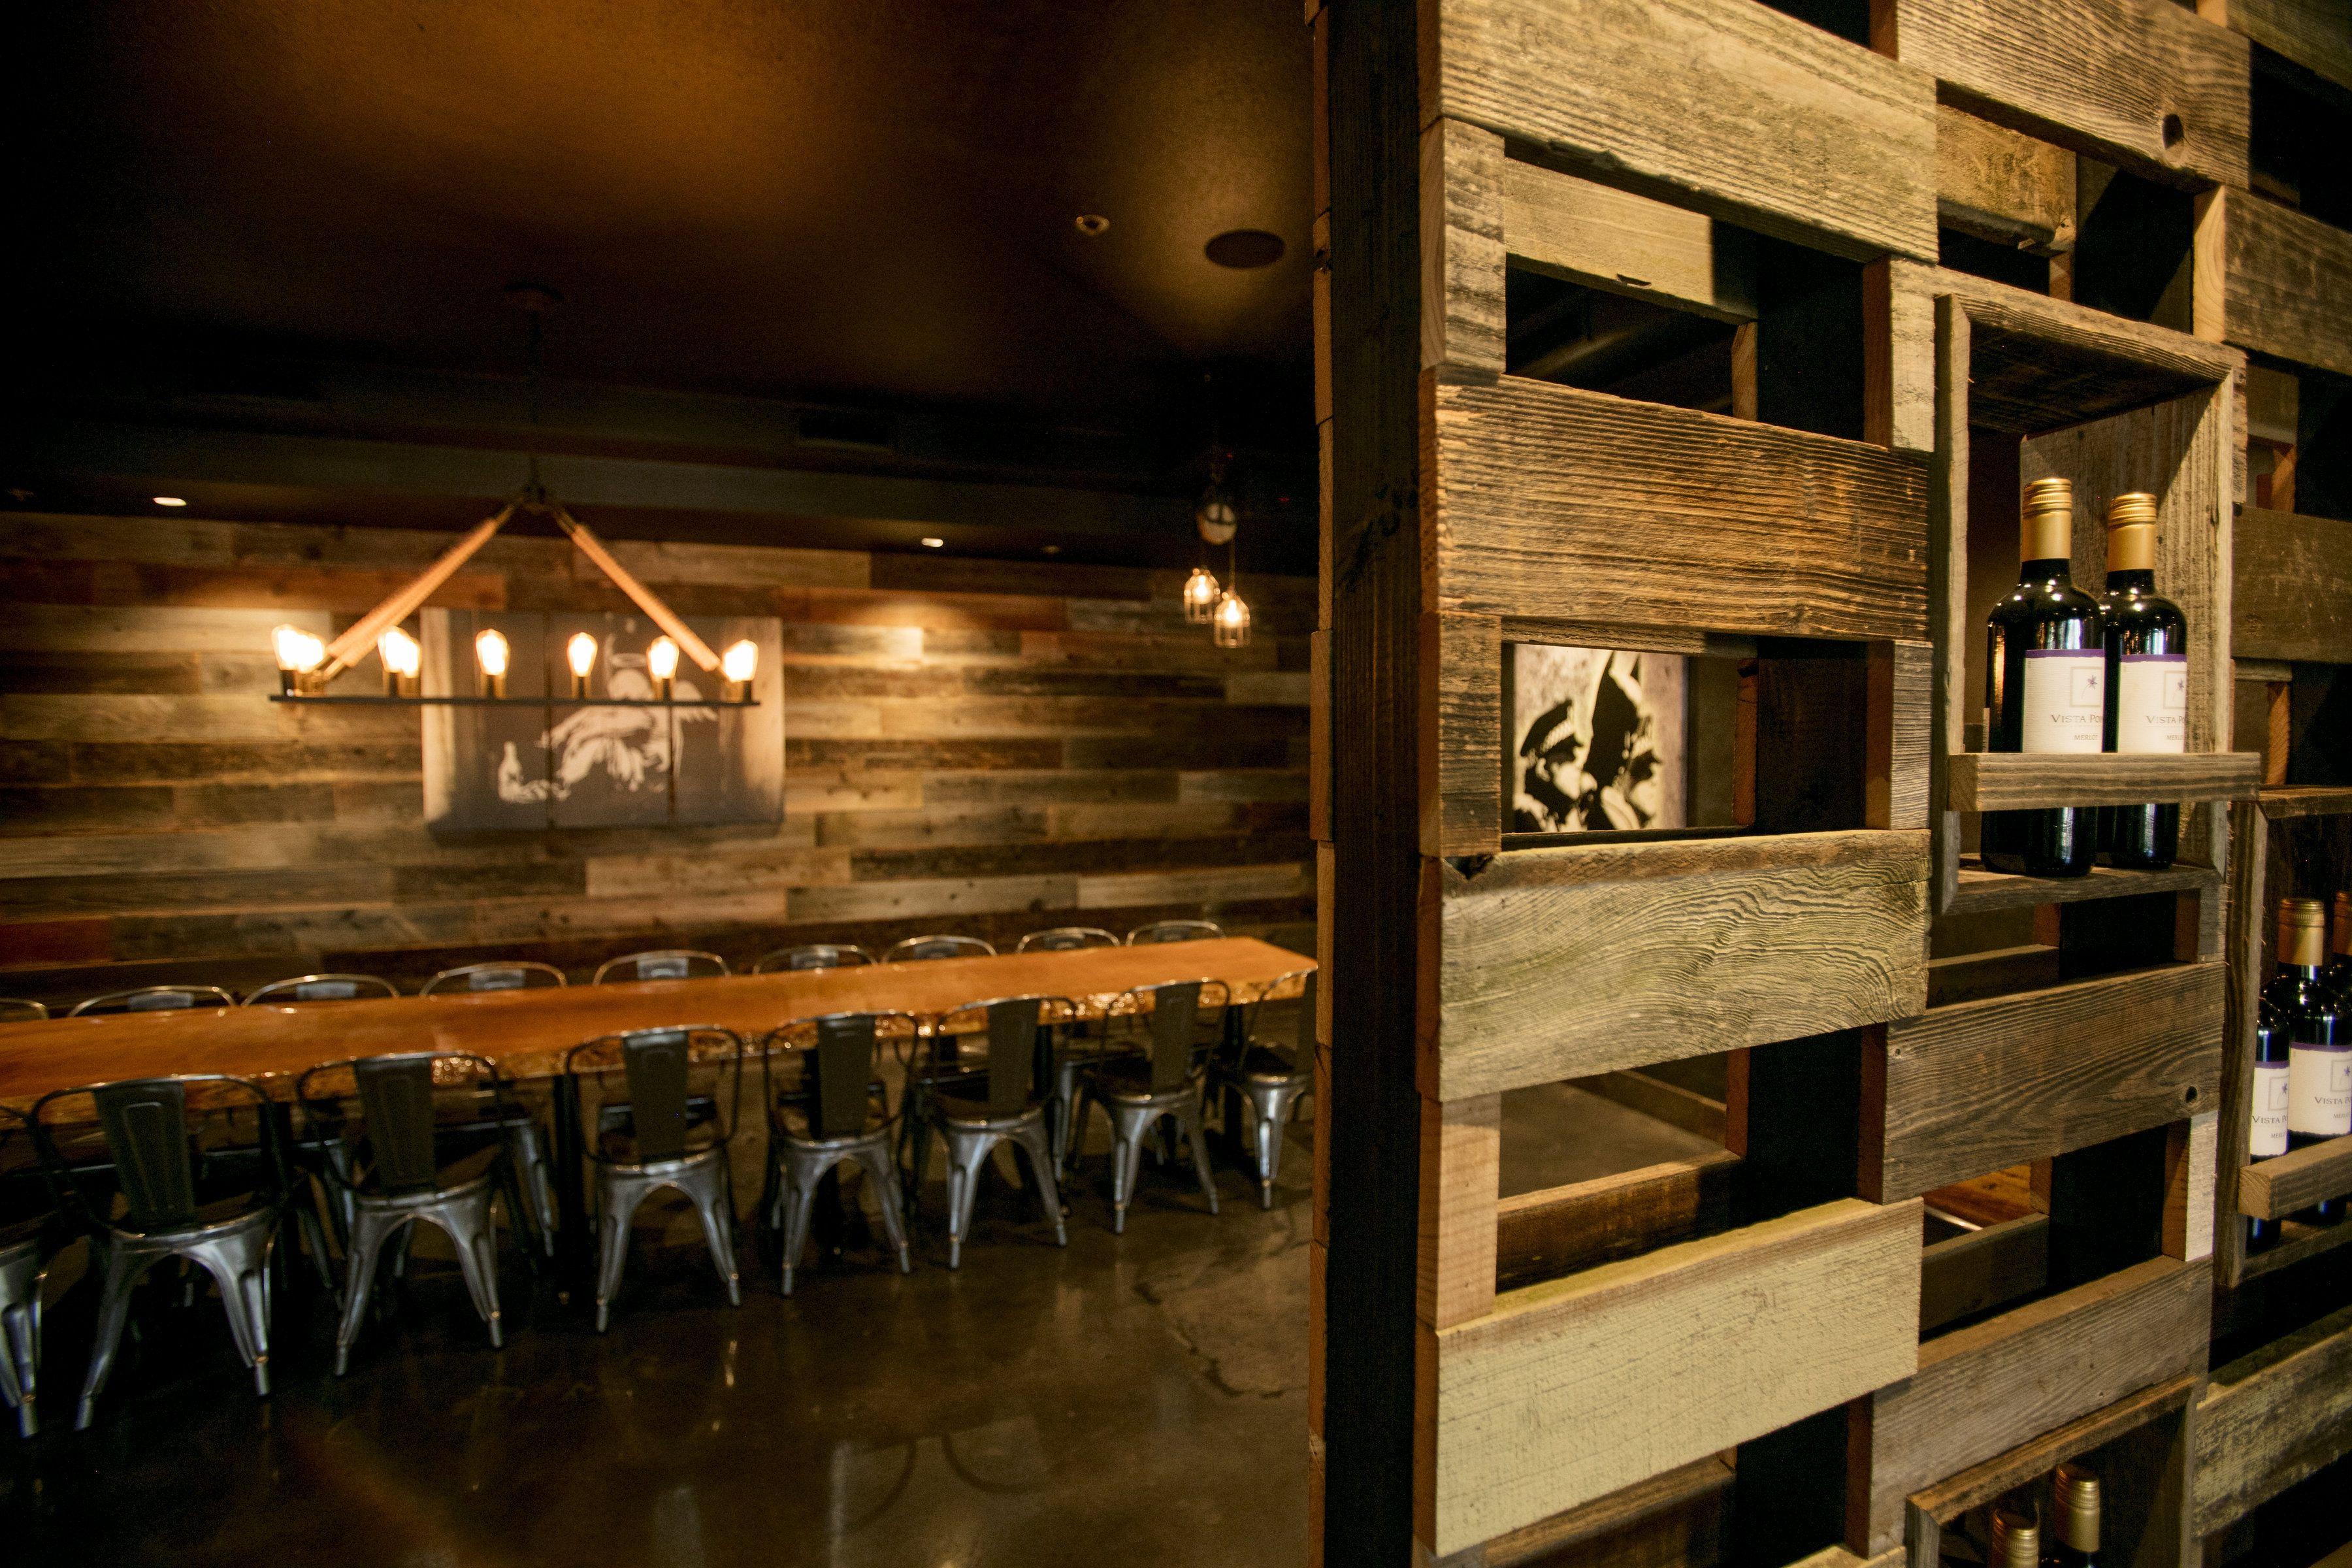 Viridian Reclaimed Wood Portland Oregon Good Neighbor Paneling Neptune  Oyster Bar Boston Massachusetts